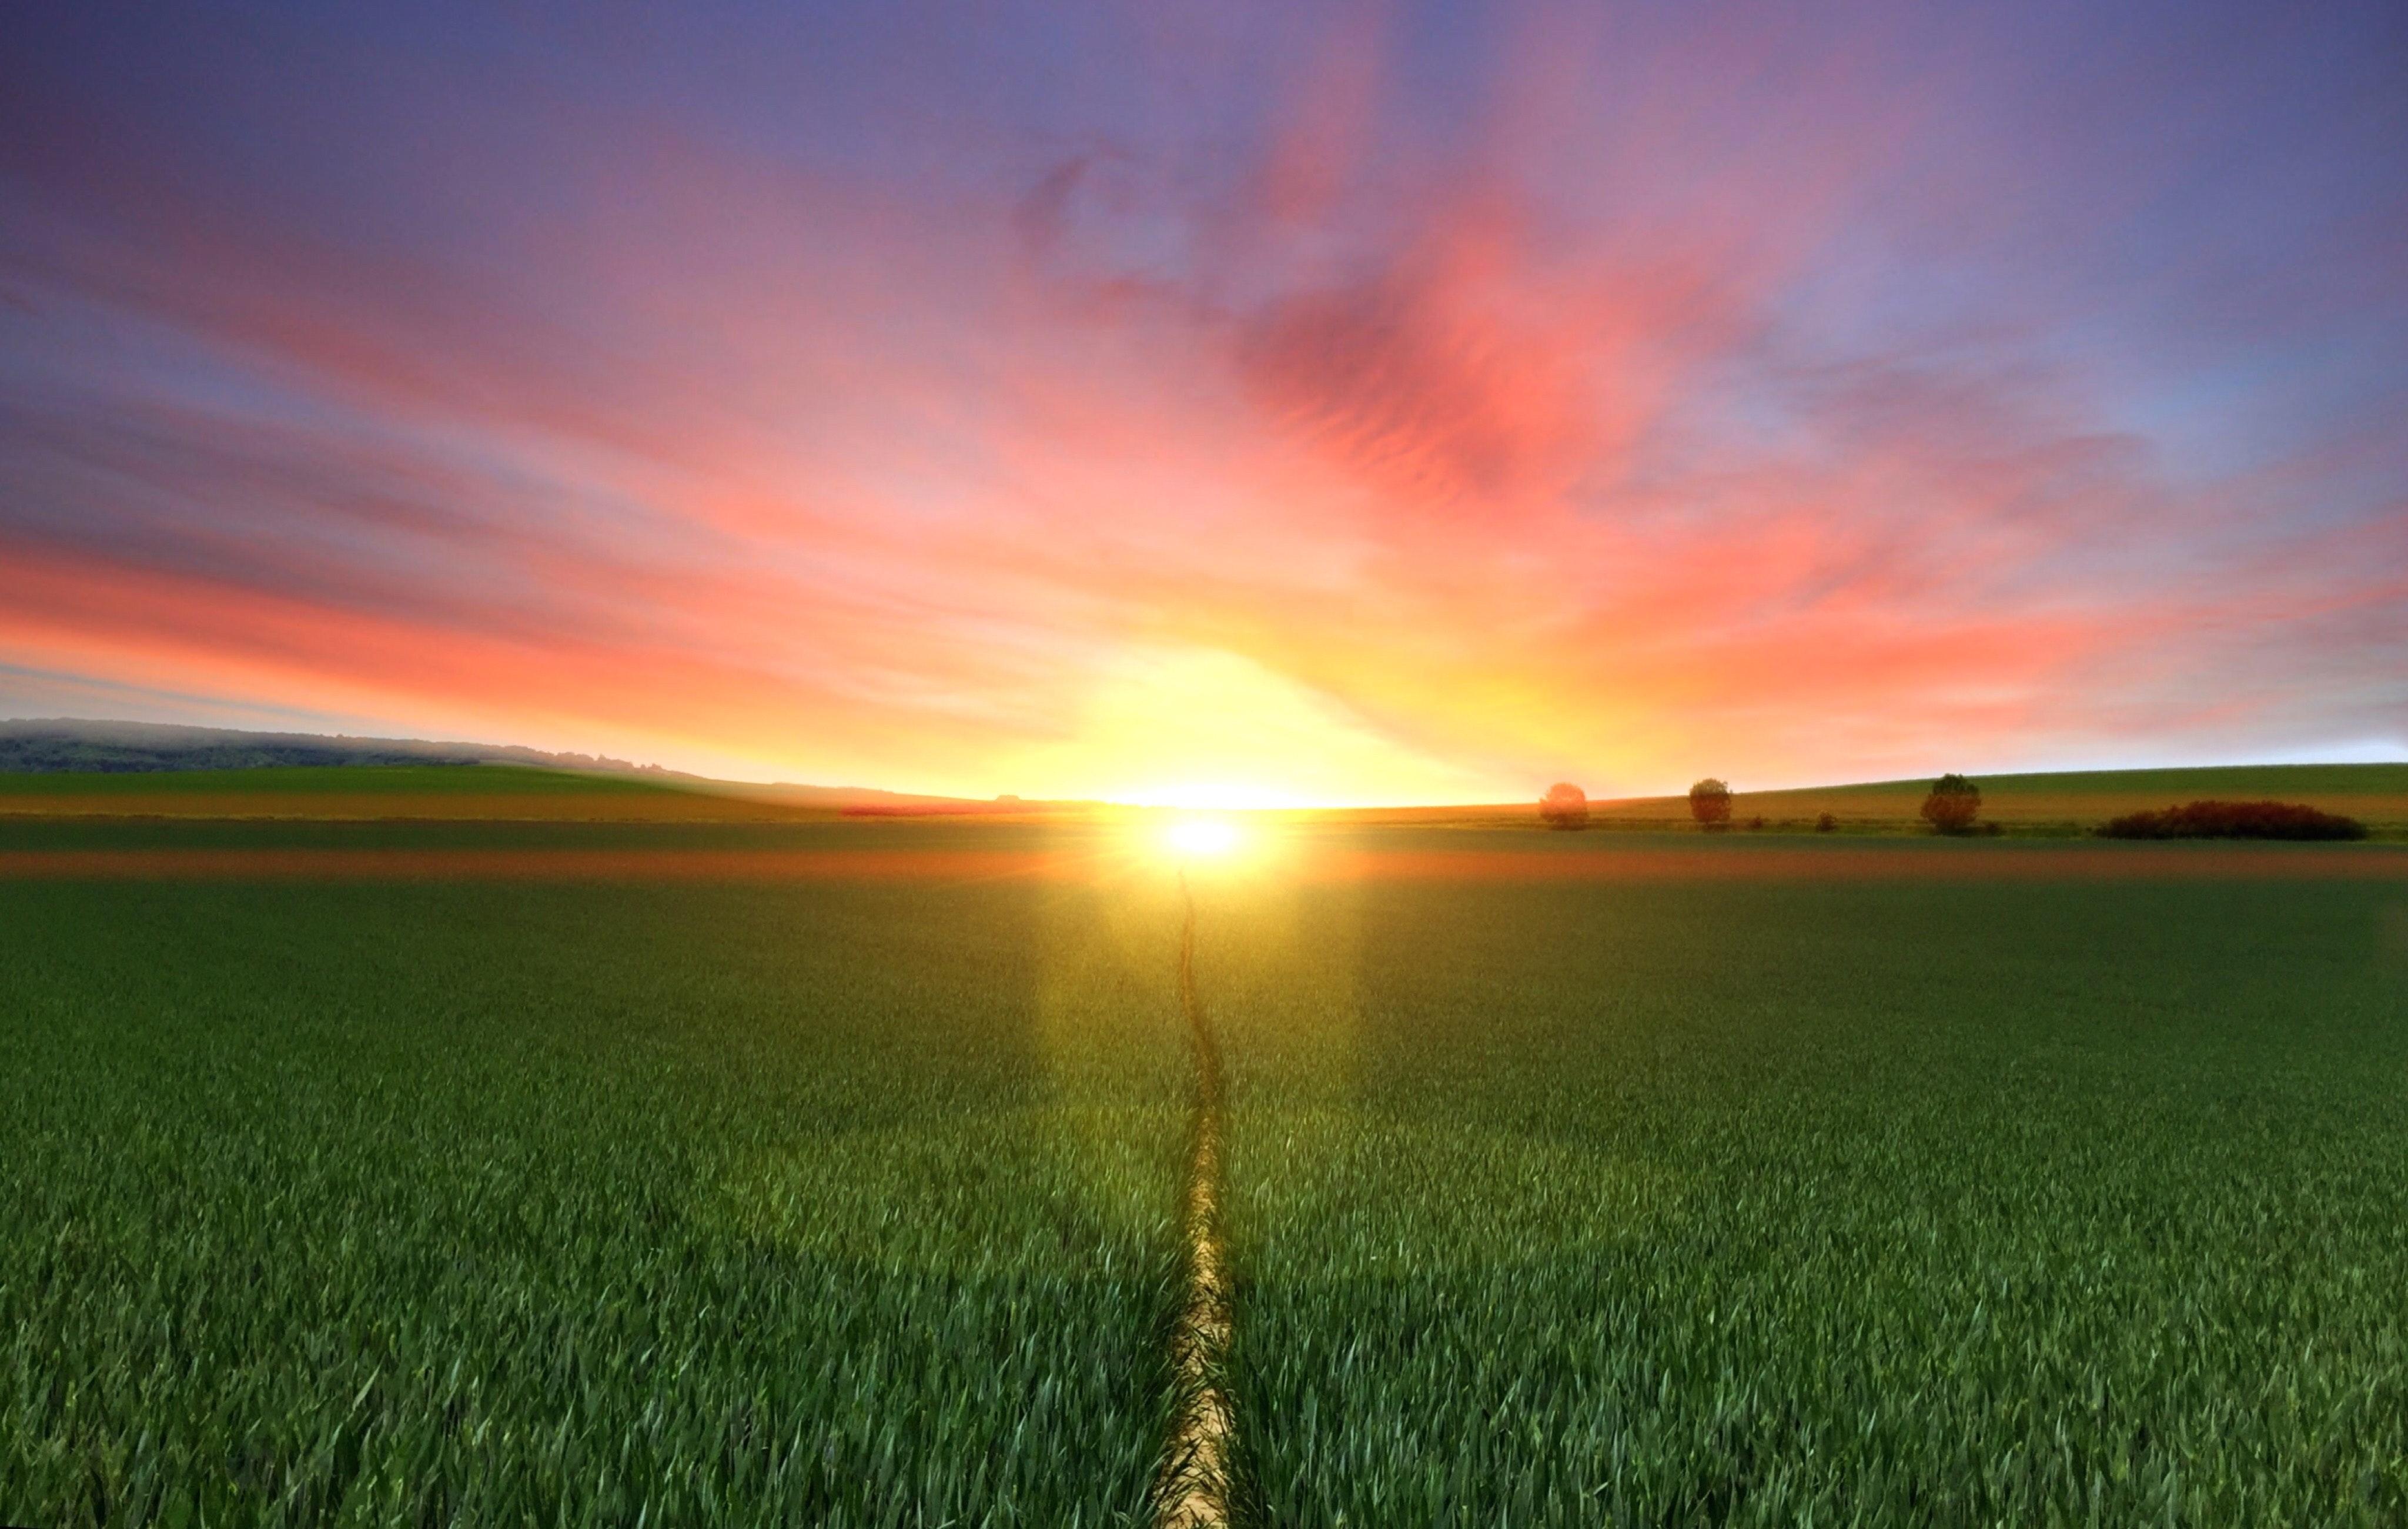 Photography of footpath between green grass field during golden hour